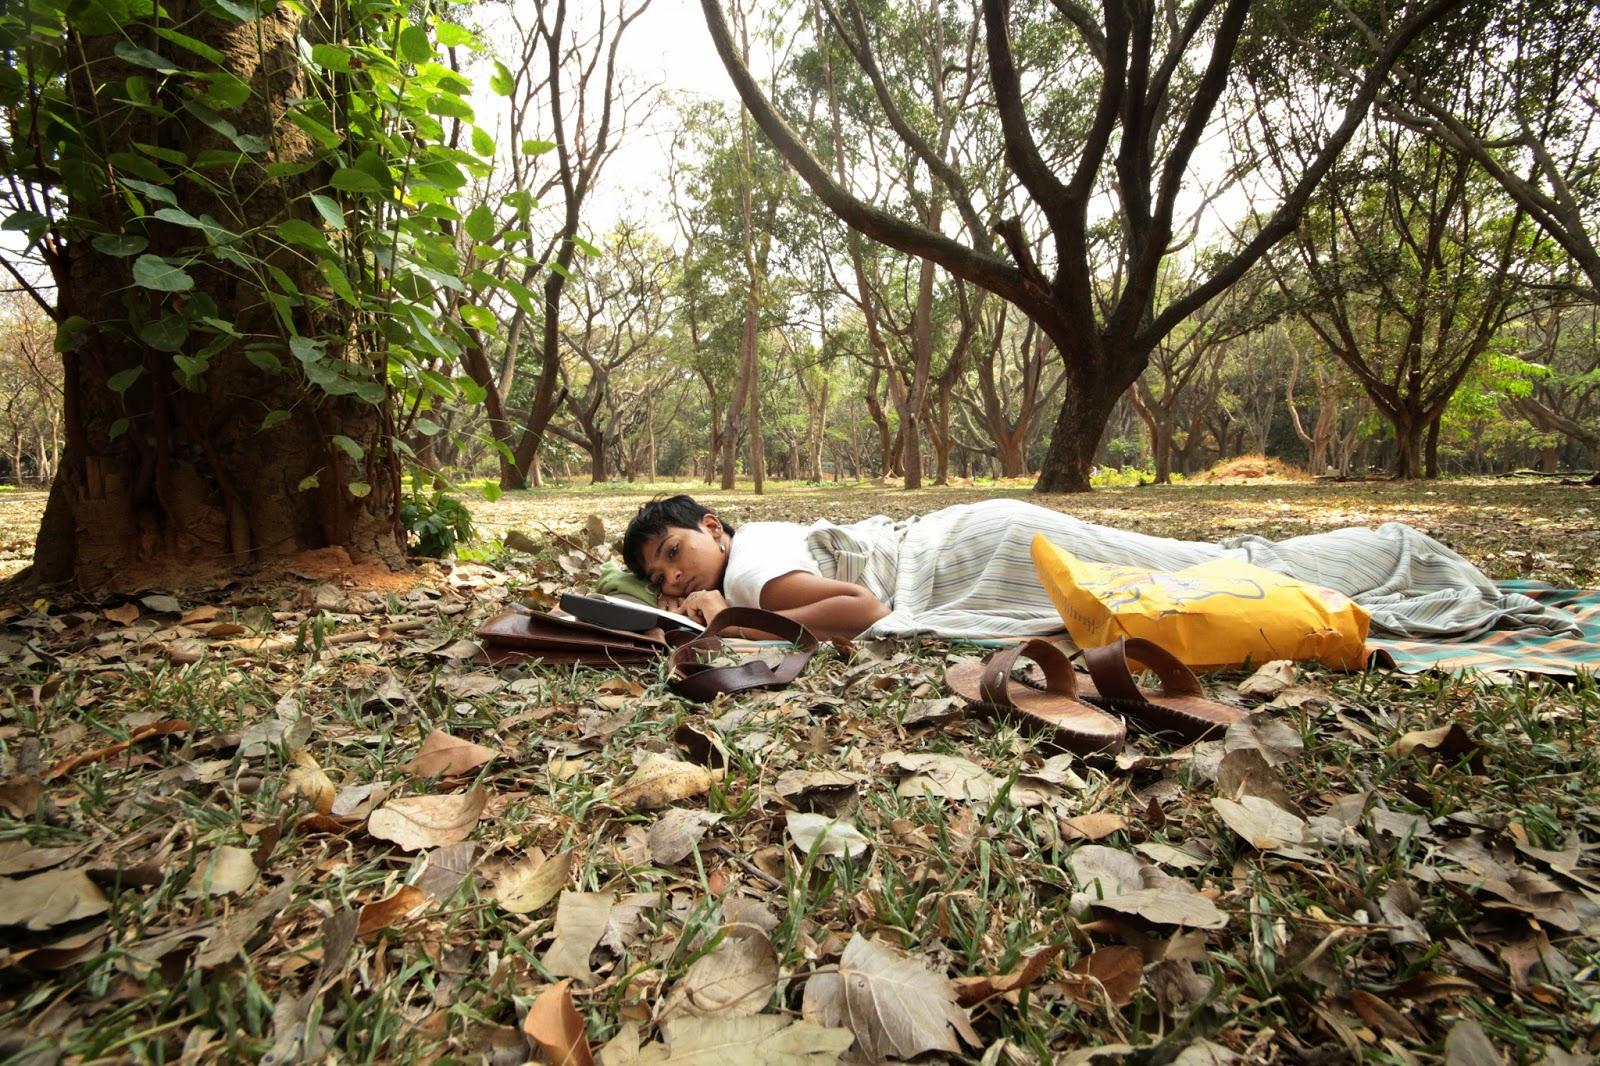 blank noise meet to sleep feb 28 bangalore. Black Bedroom Furniture Sets. Home Design Ideas